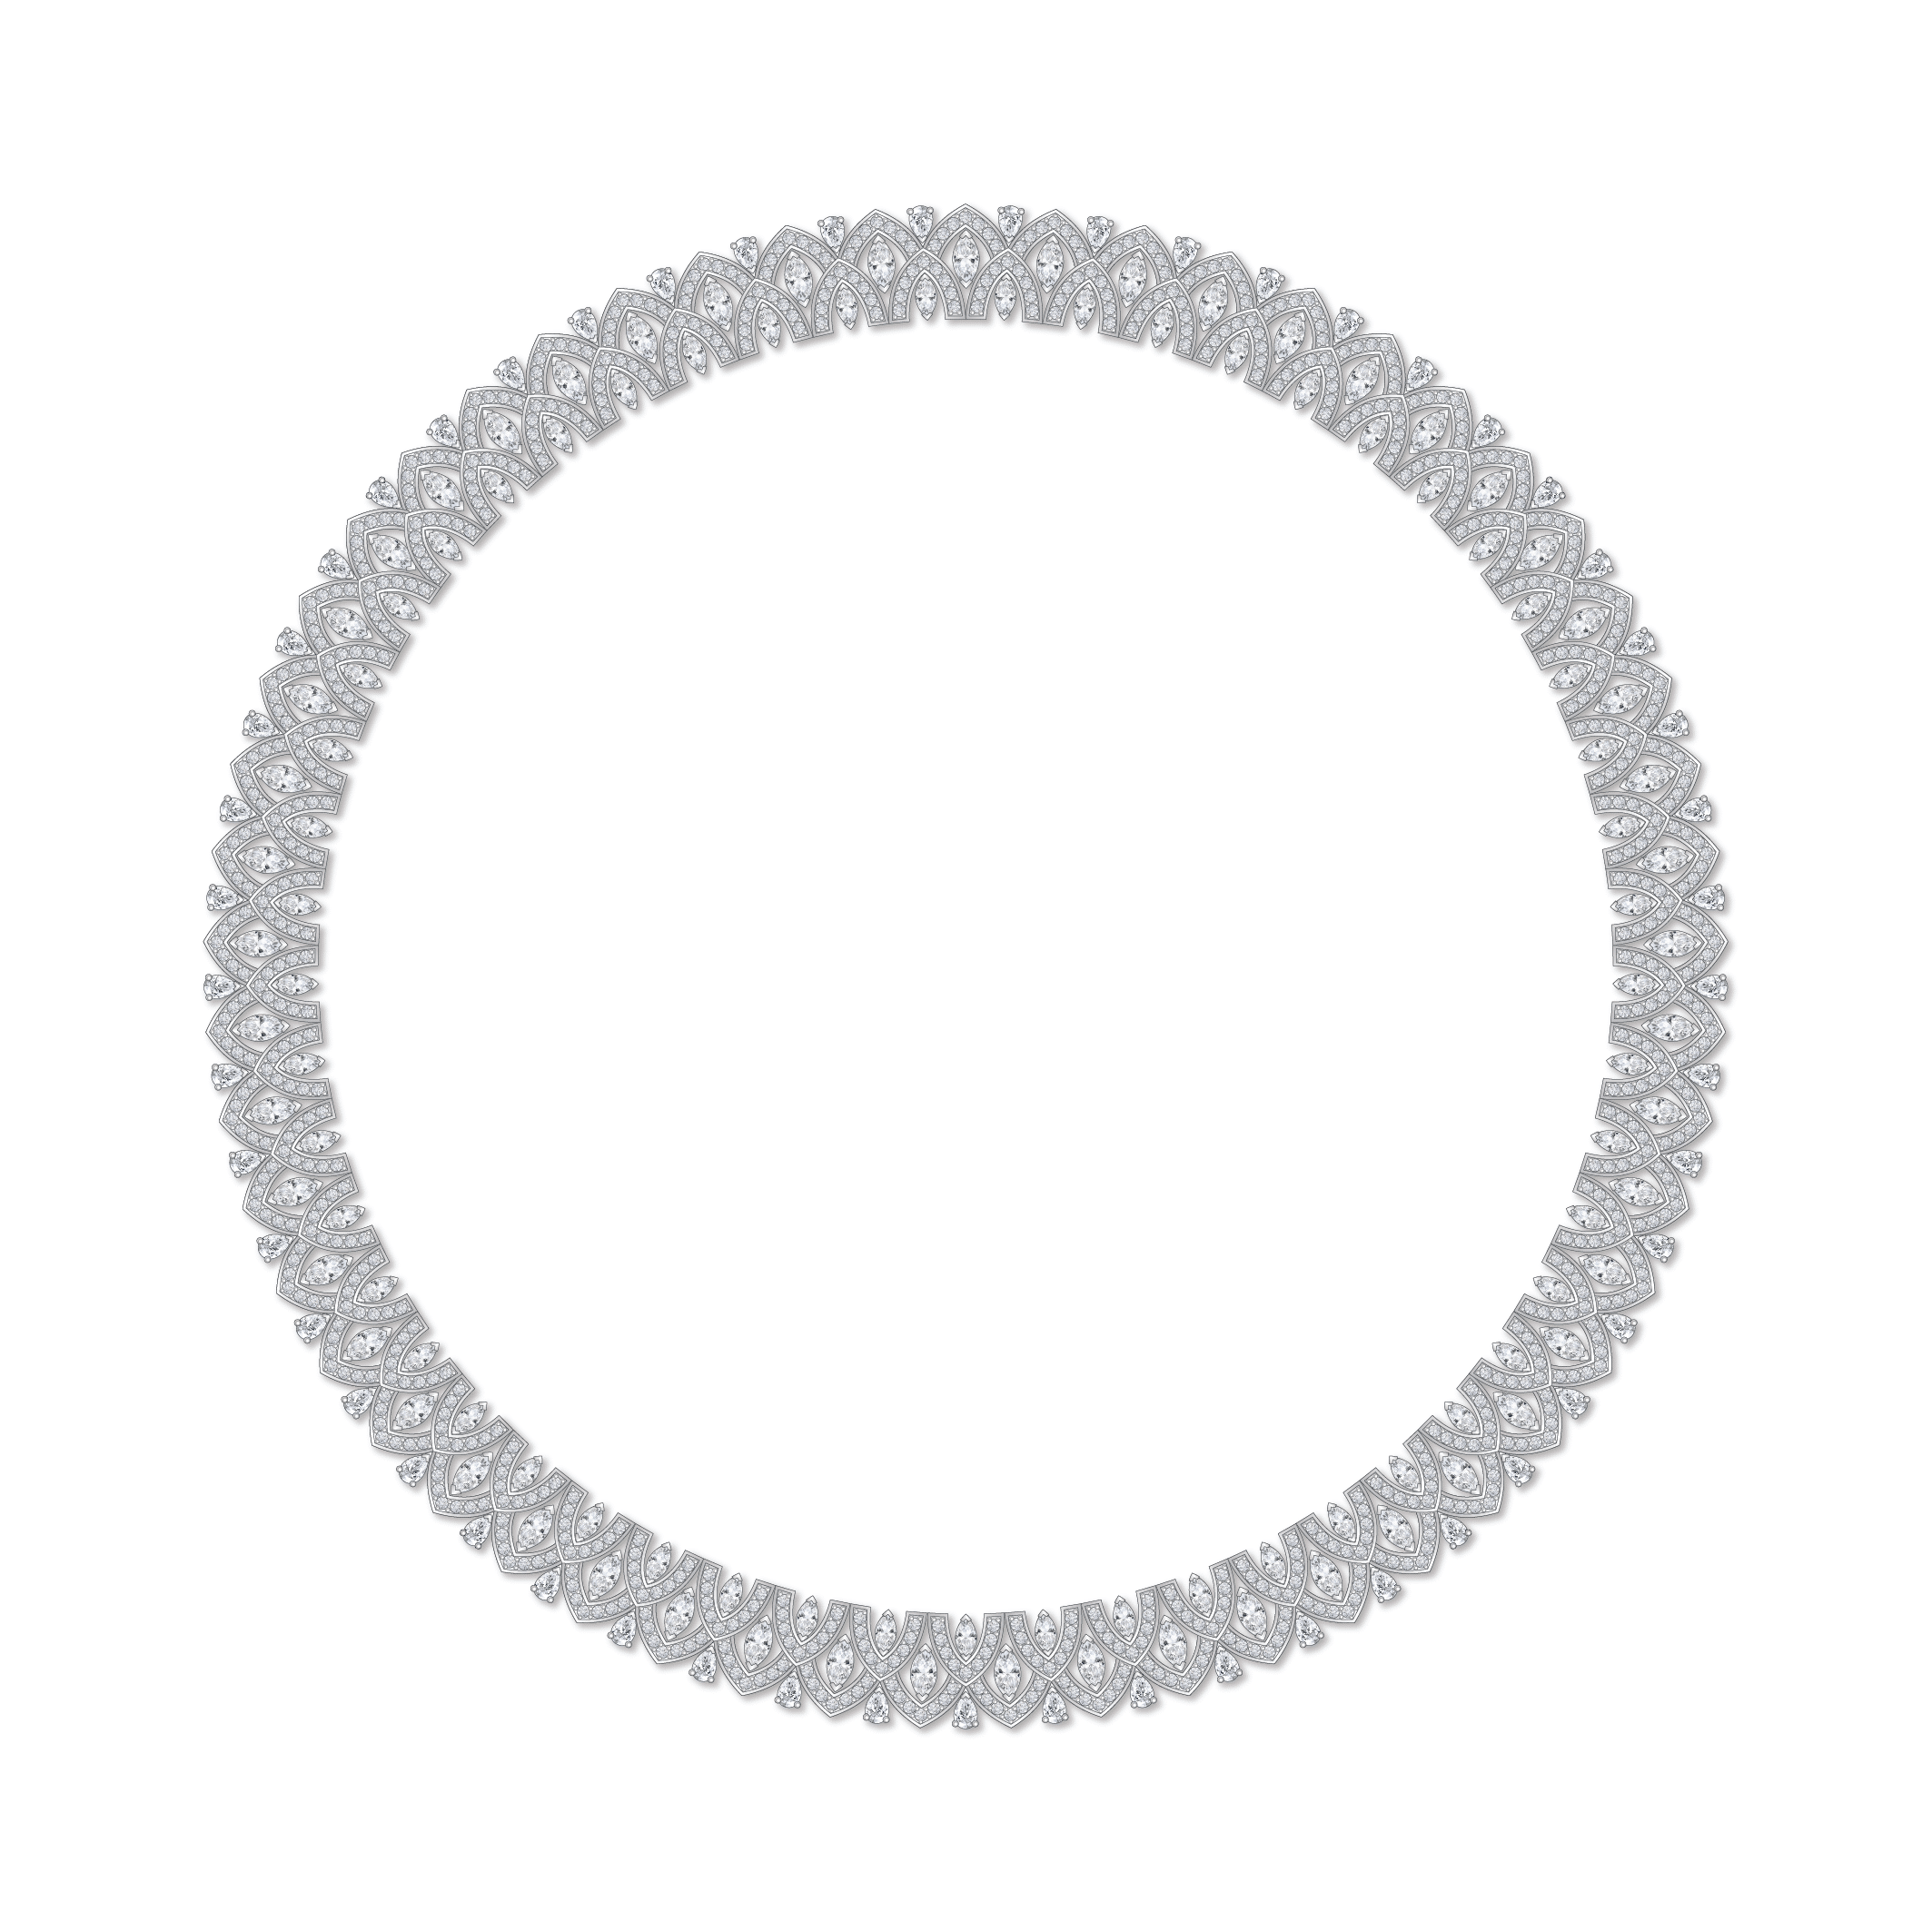 Dessin collier diamants or blanc